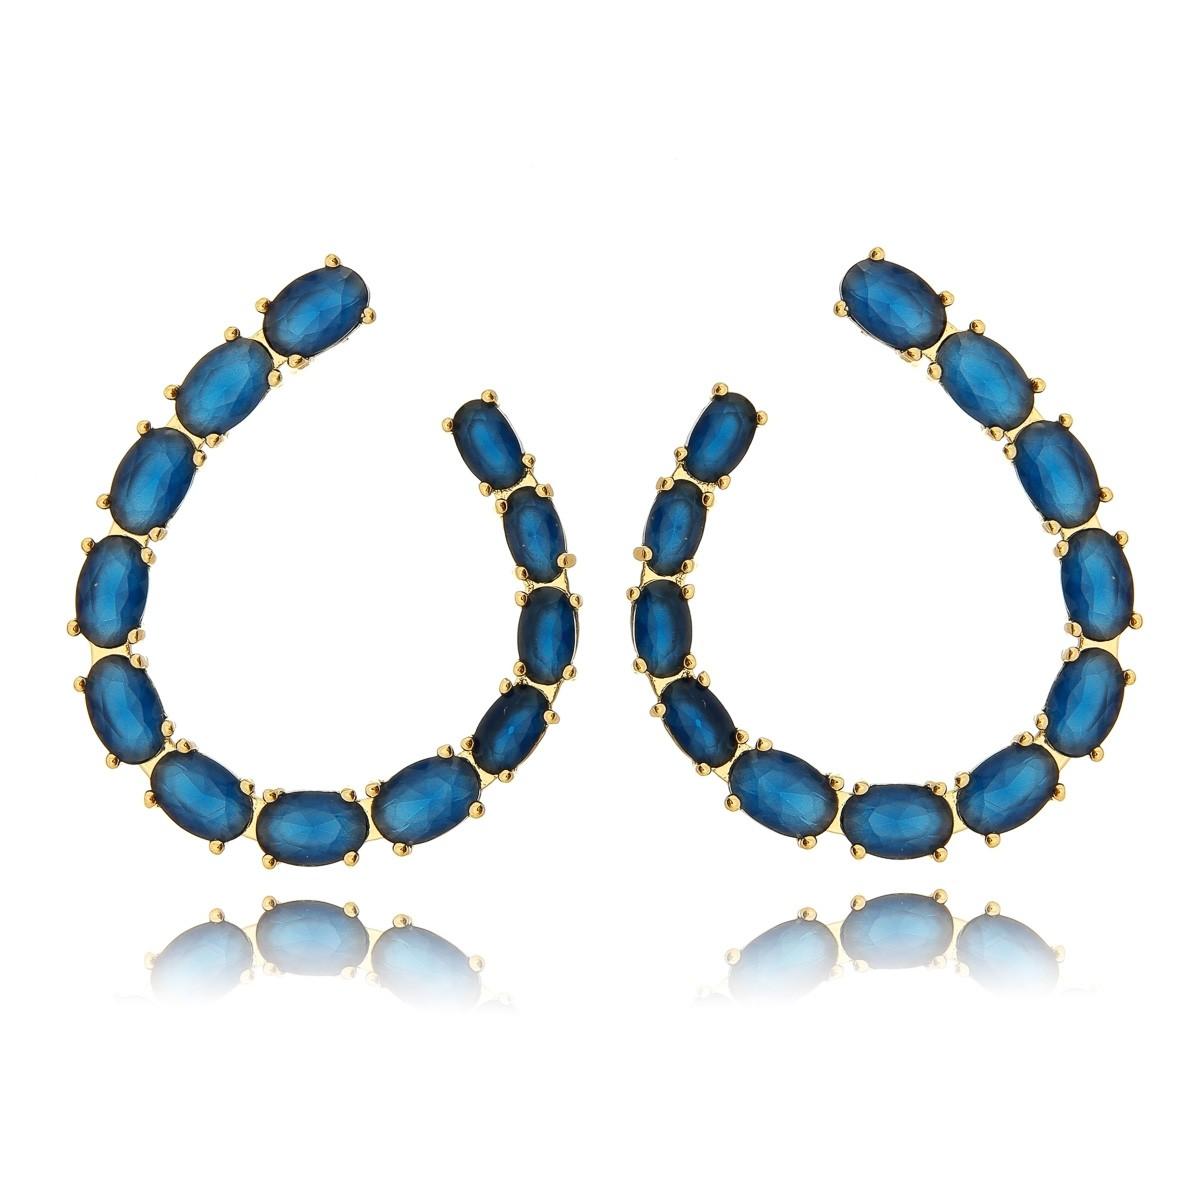 Brinco Zircônia Oval Azul Semijoia em Ouro 18K  - Soloyou